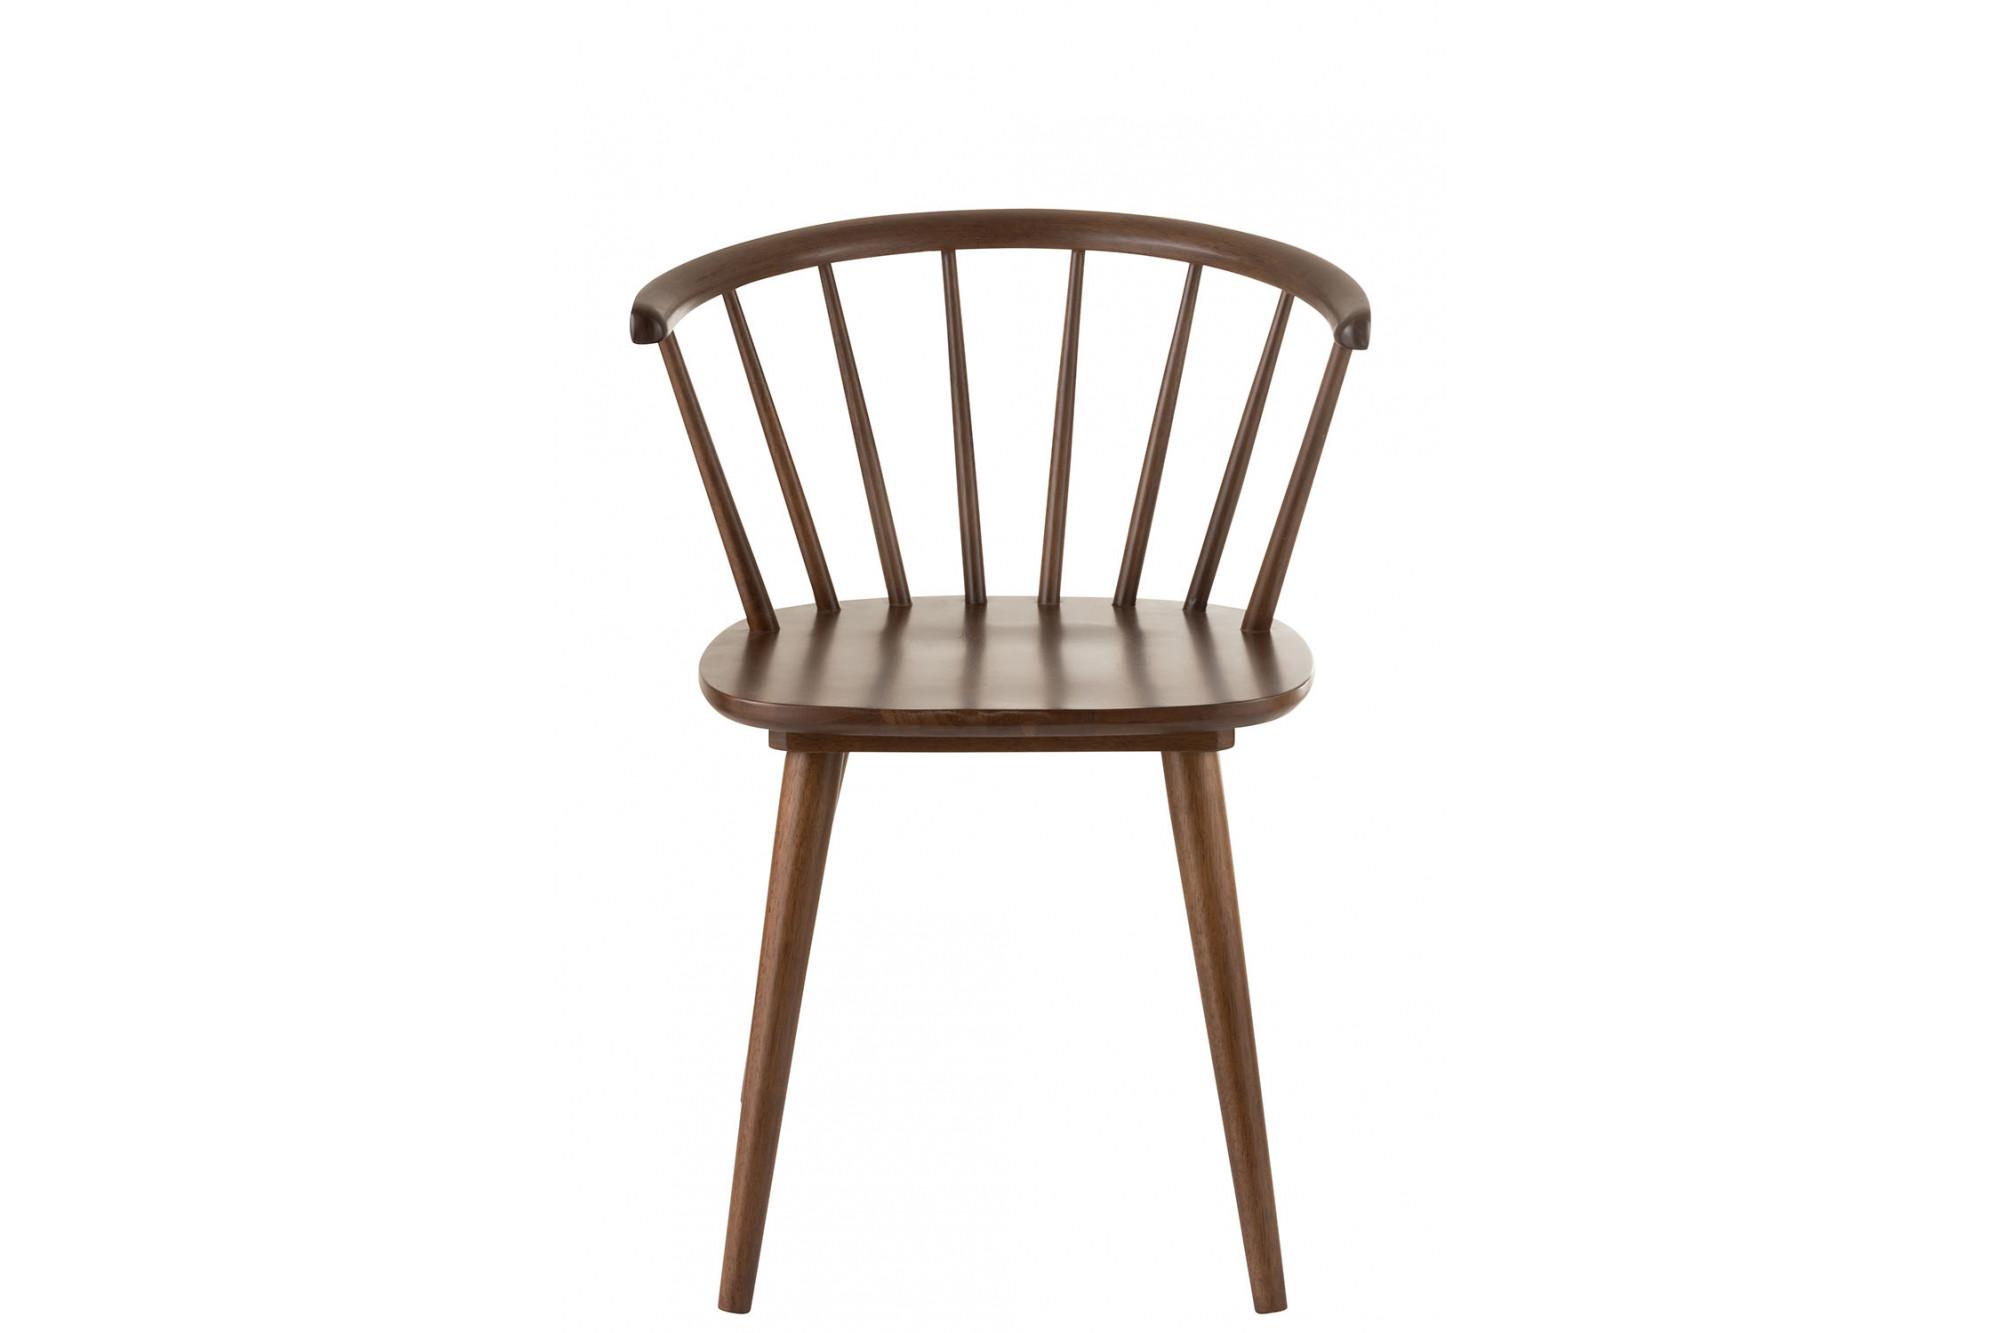 Bois Hellin Vintage RétroStyle En Chaise k8nwP0O